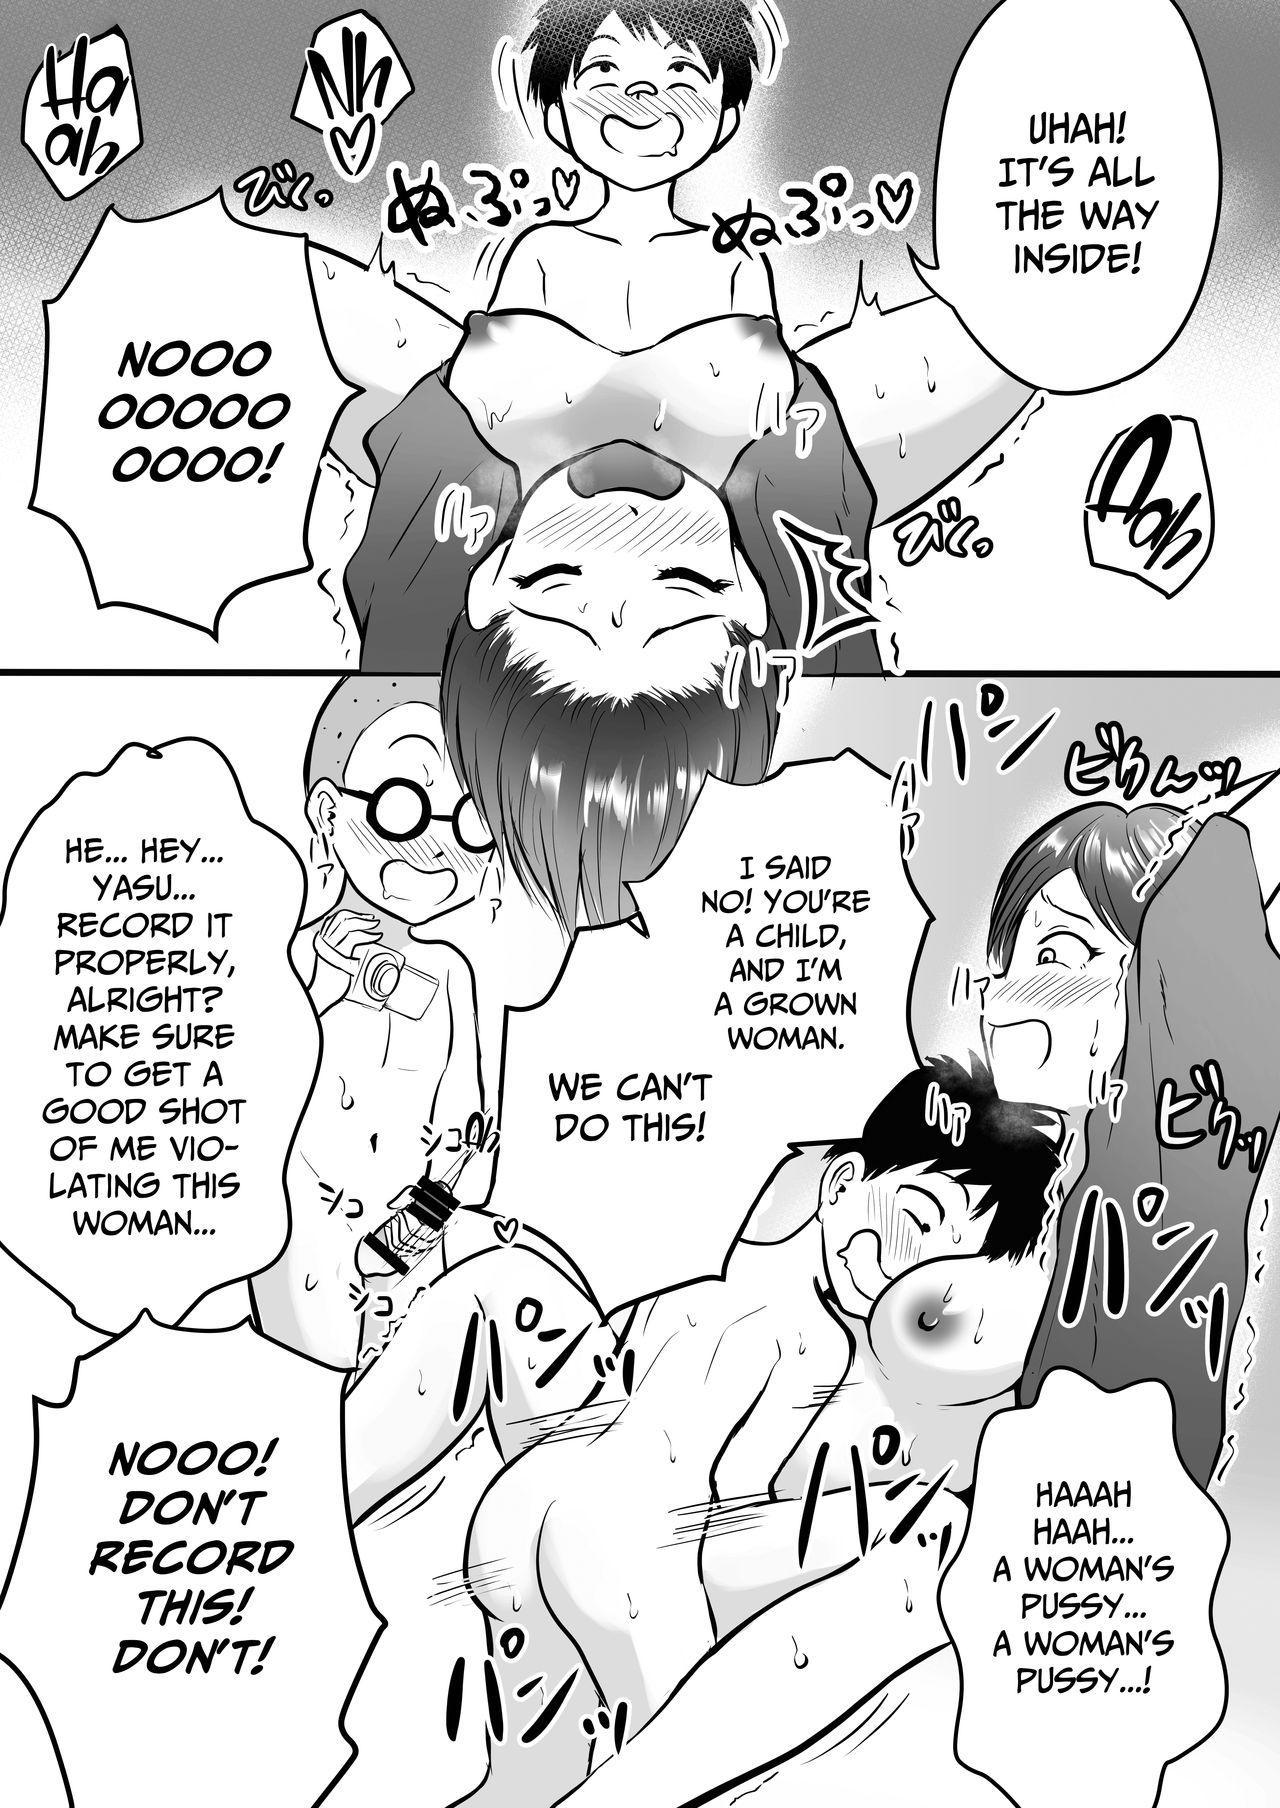 Onsen Ryokan de Zurineta Shuushuu Mission! | The Hot Springs Inn Fap Material Gathering Mission! 17